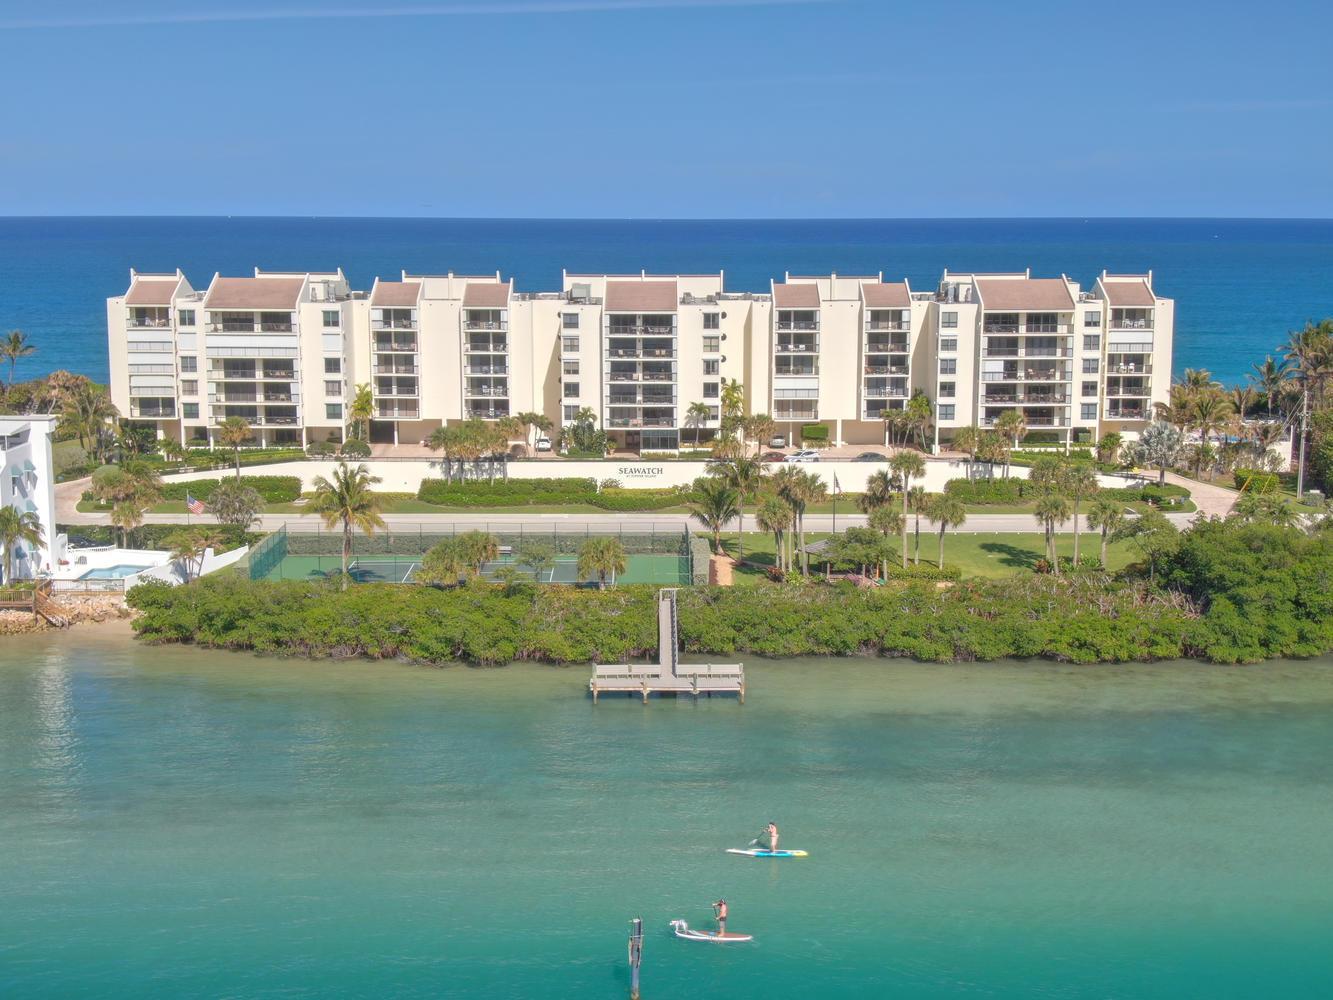 19670 Beach Road D414, Jupiter, Florida 33469, 3 Bedrooms Bedrooms, ,2.1 BathroomsBathrooms,A,Condominium,Beach,RX-10611618